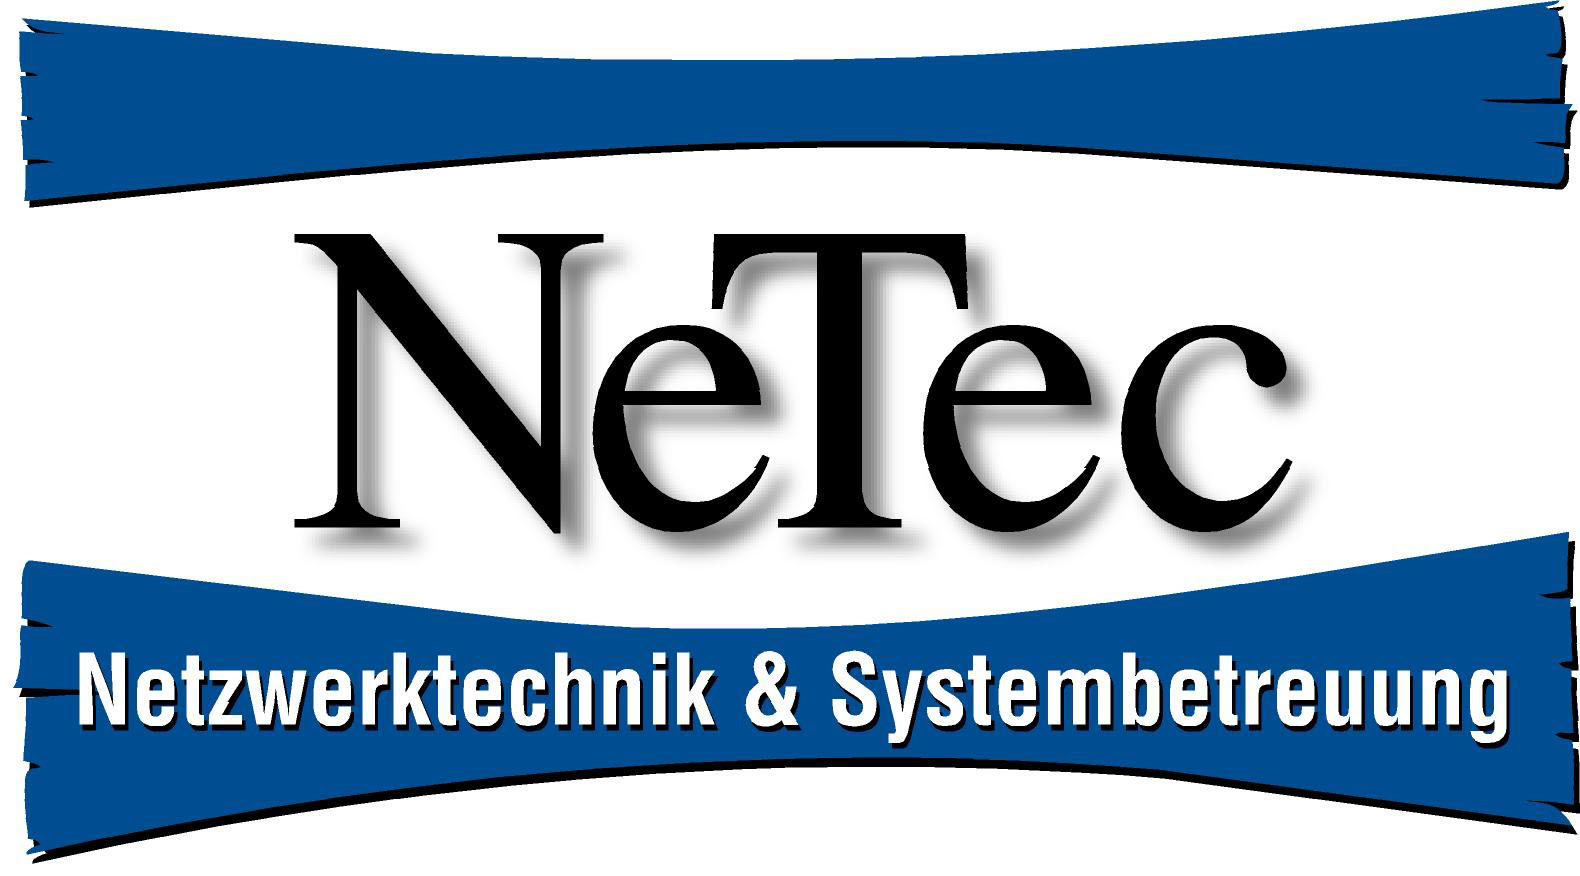 NeTec - Netzwerktechnik & Systembetreuung GmbH